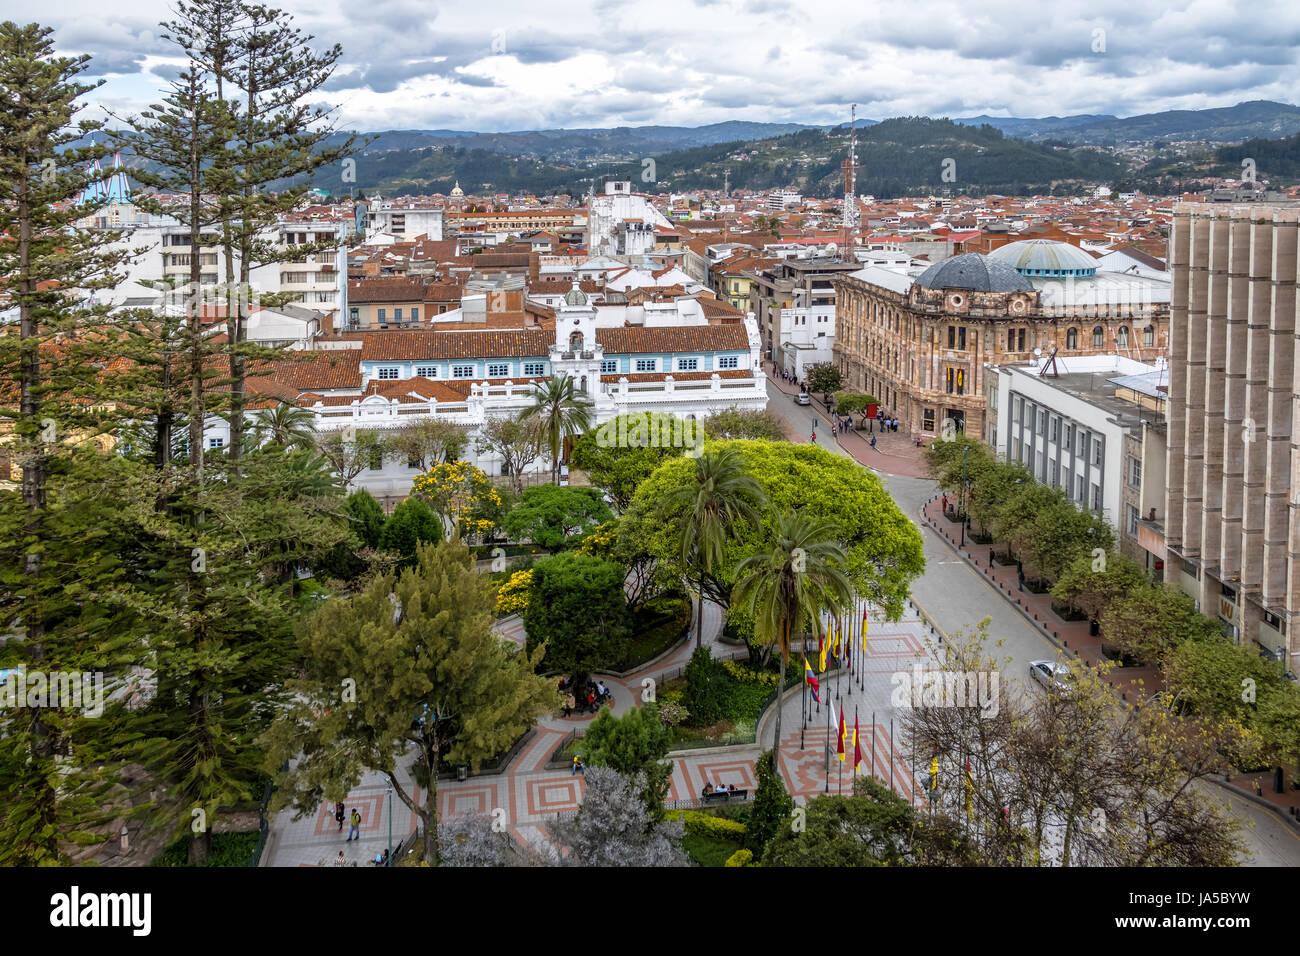 Luftaufnahme der Stadt Cuenca und Park Calderon - Cuenca, Ecuador Stockbild